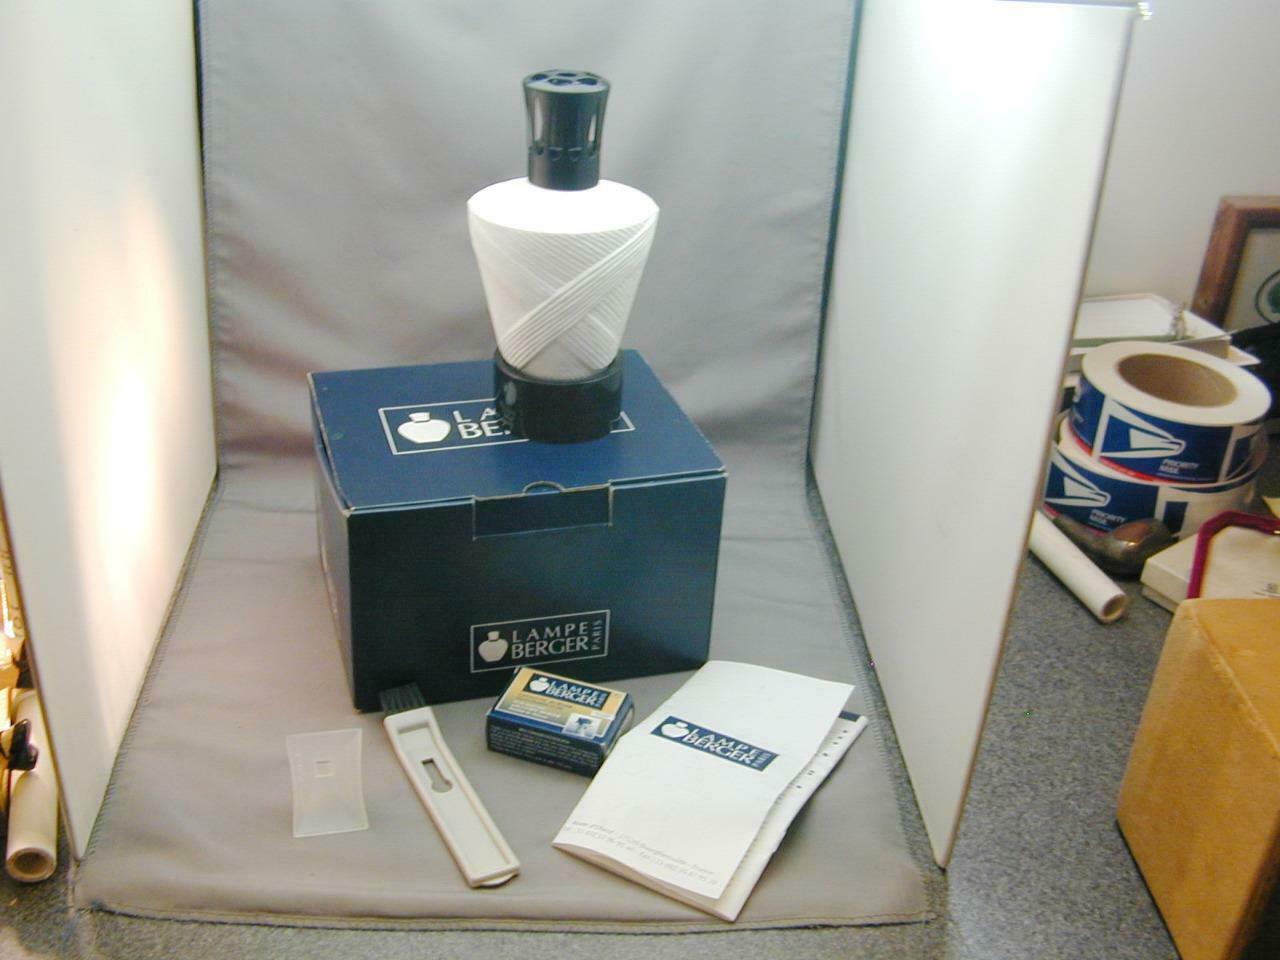 FAB Lampe Berger Paris Fragrance Lamp Matte Embossed White Porcelain In Box - $150.00